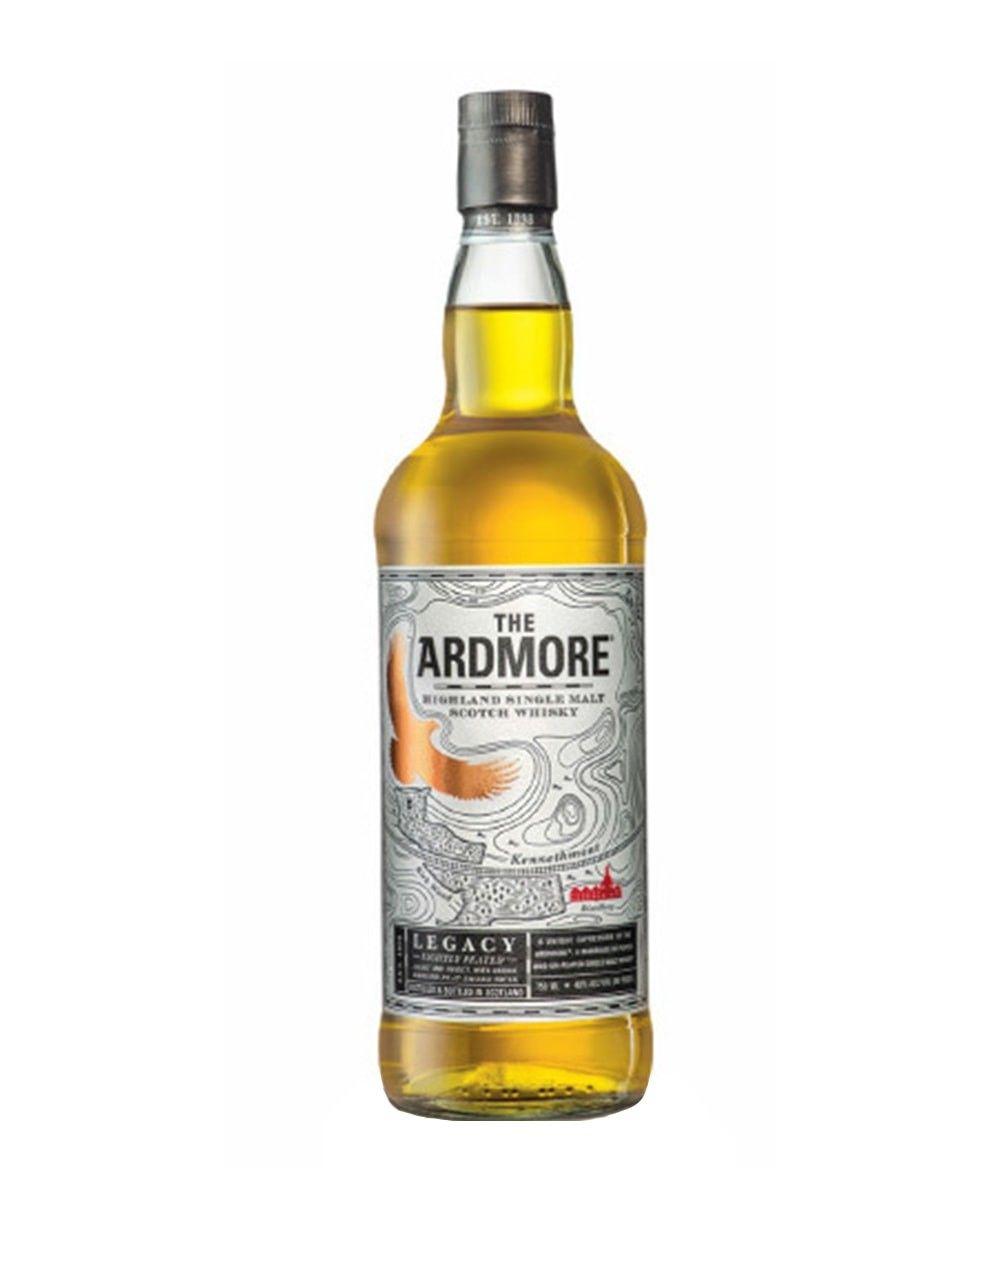 The Ardmore Legacy Highland Single Malt Scotch Whisky